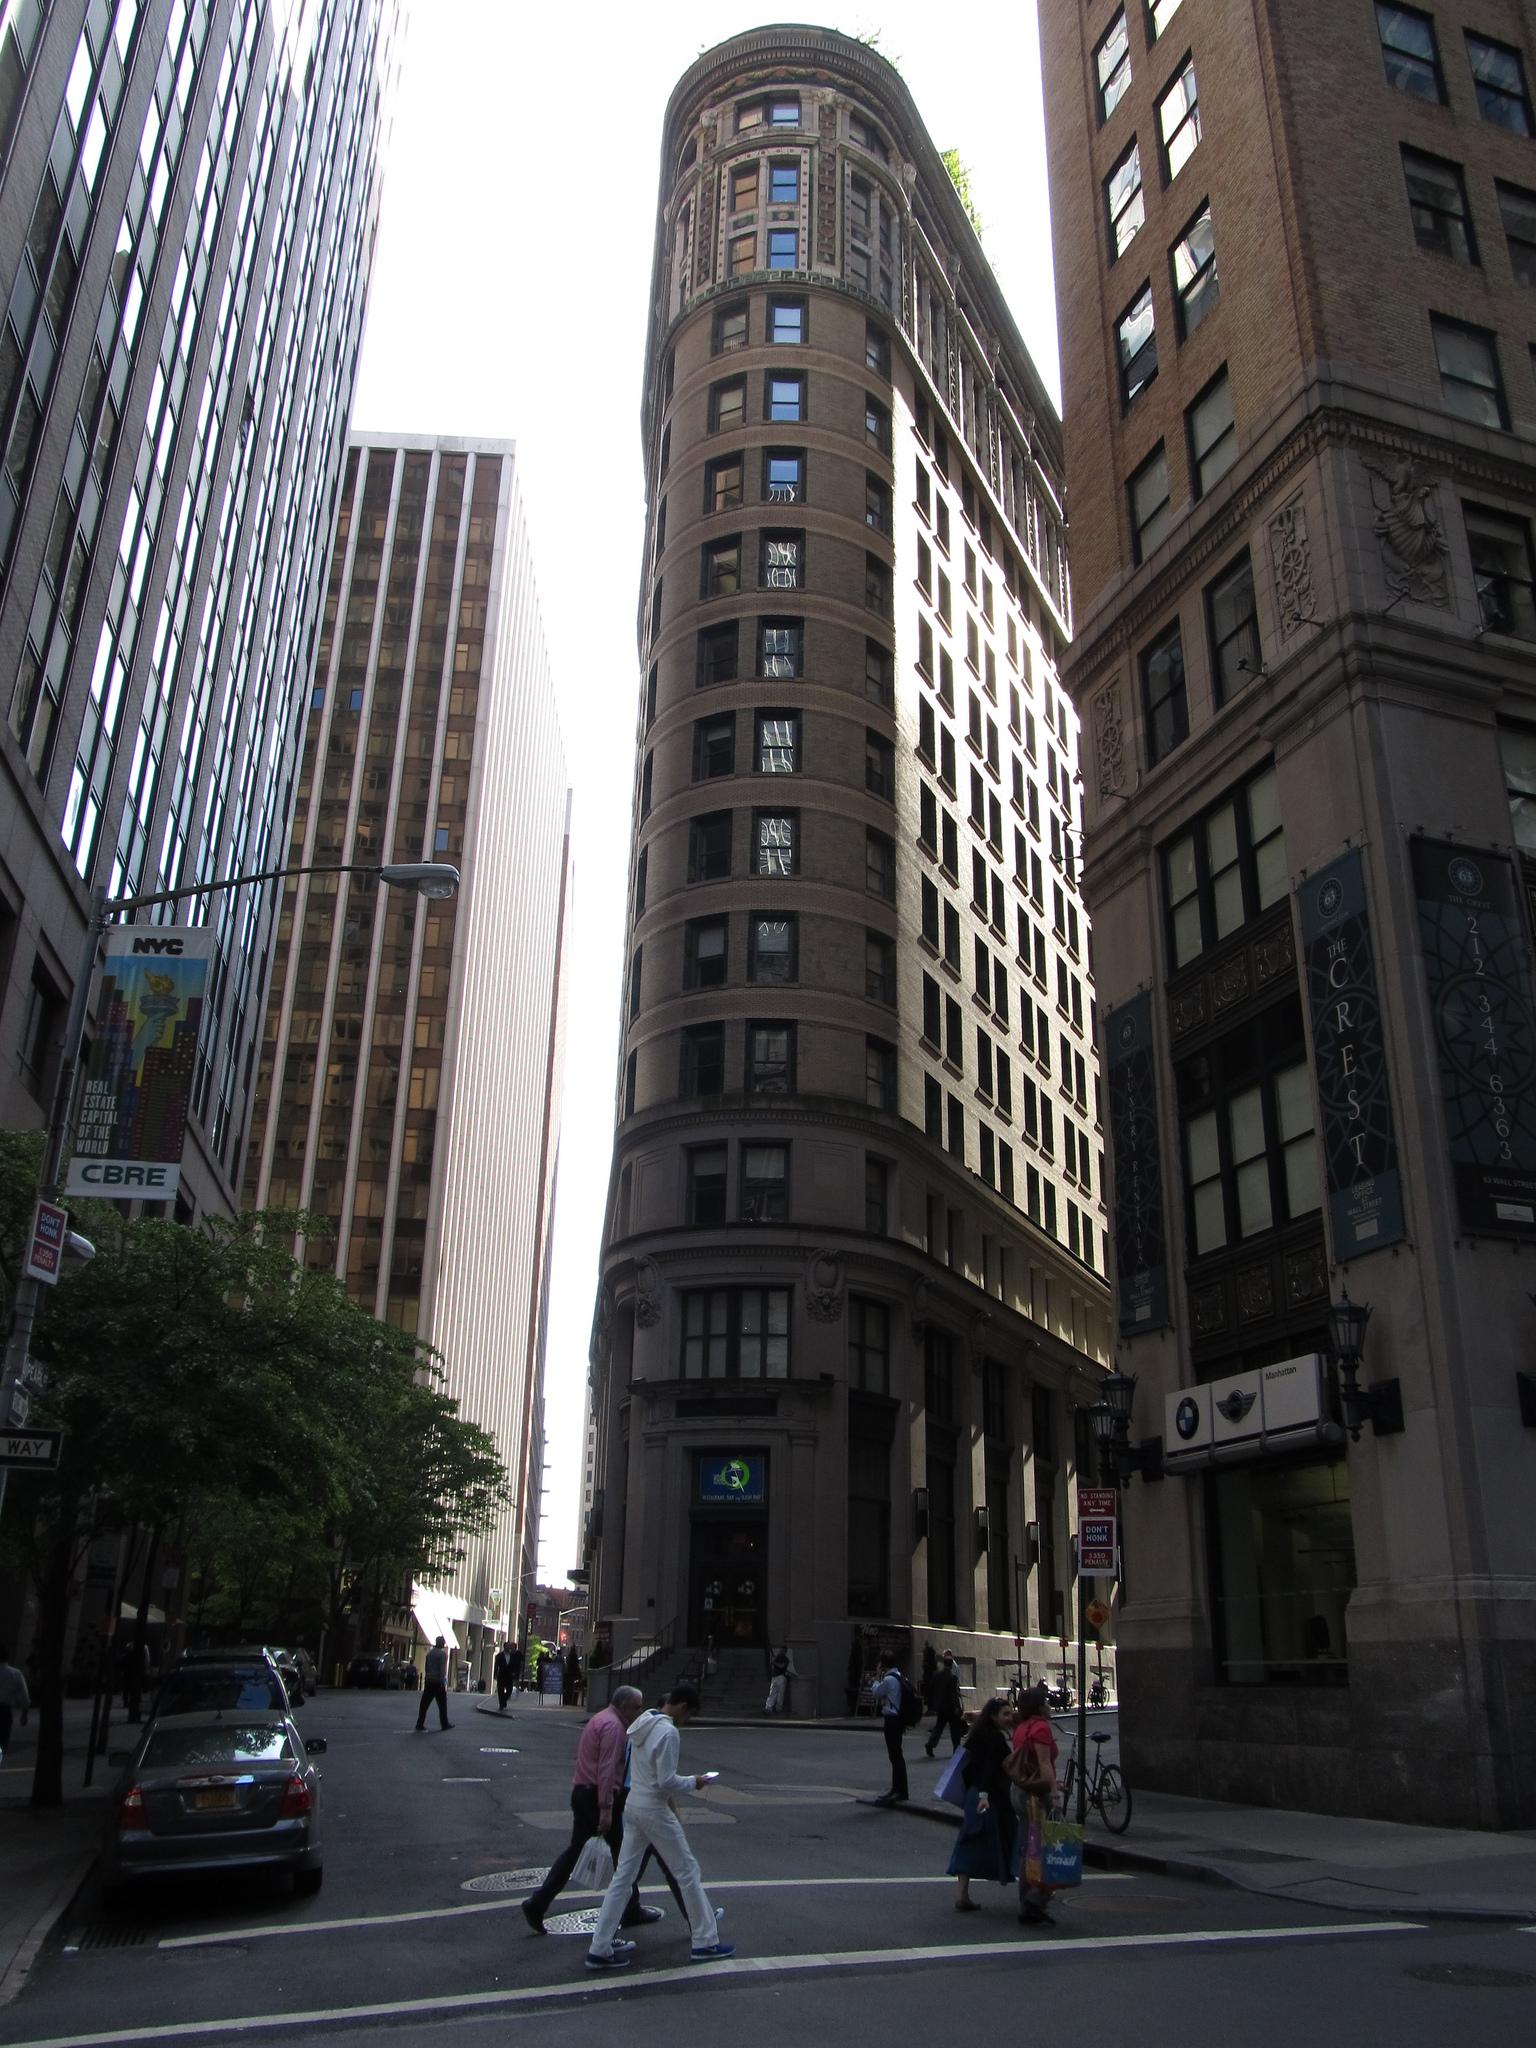 Hotel New York Wall Street